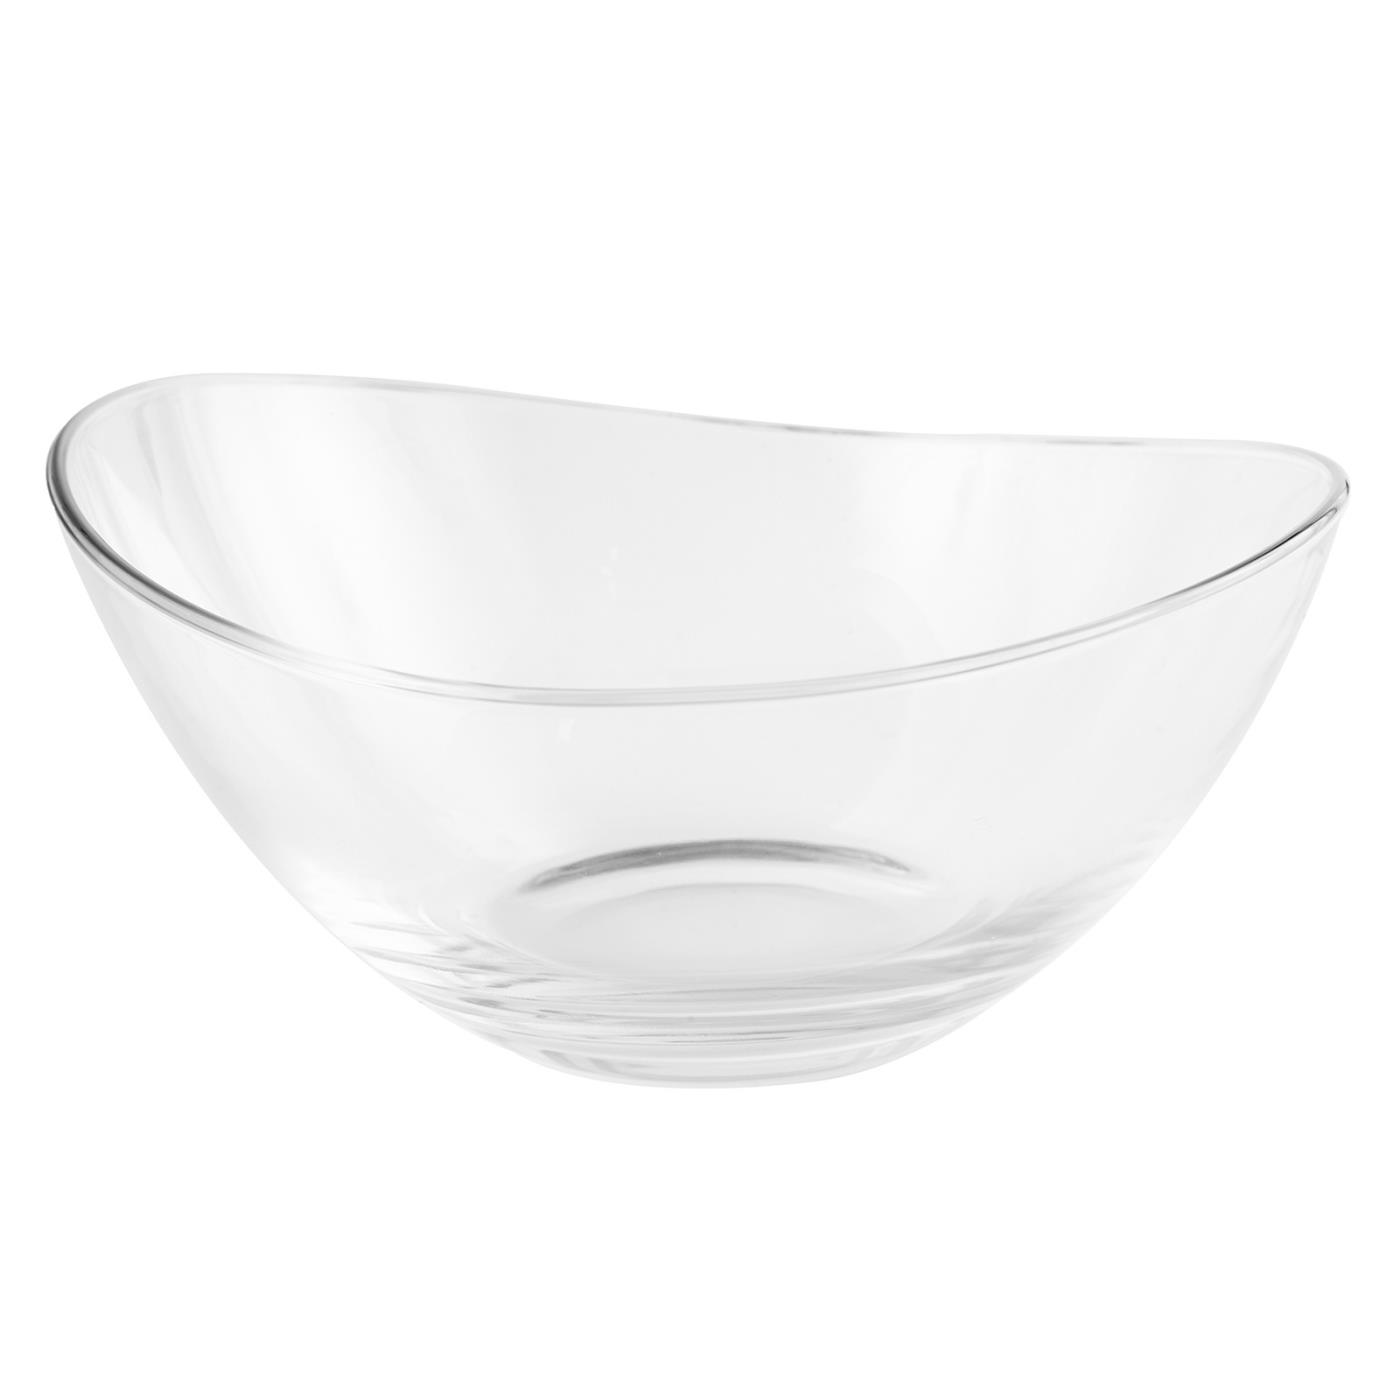 "Glass Papaya Bowl - 9.5"""